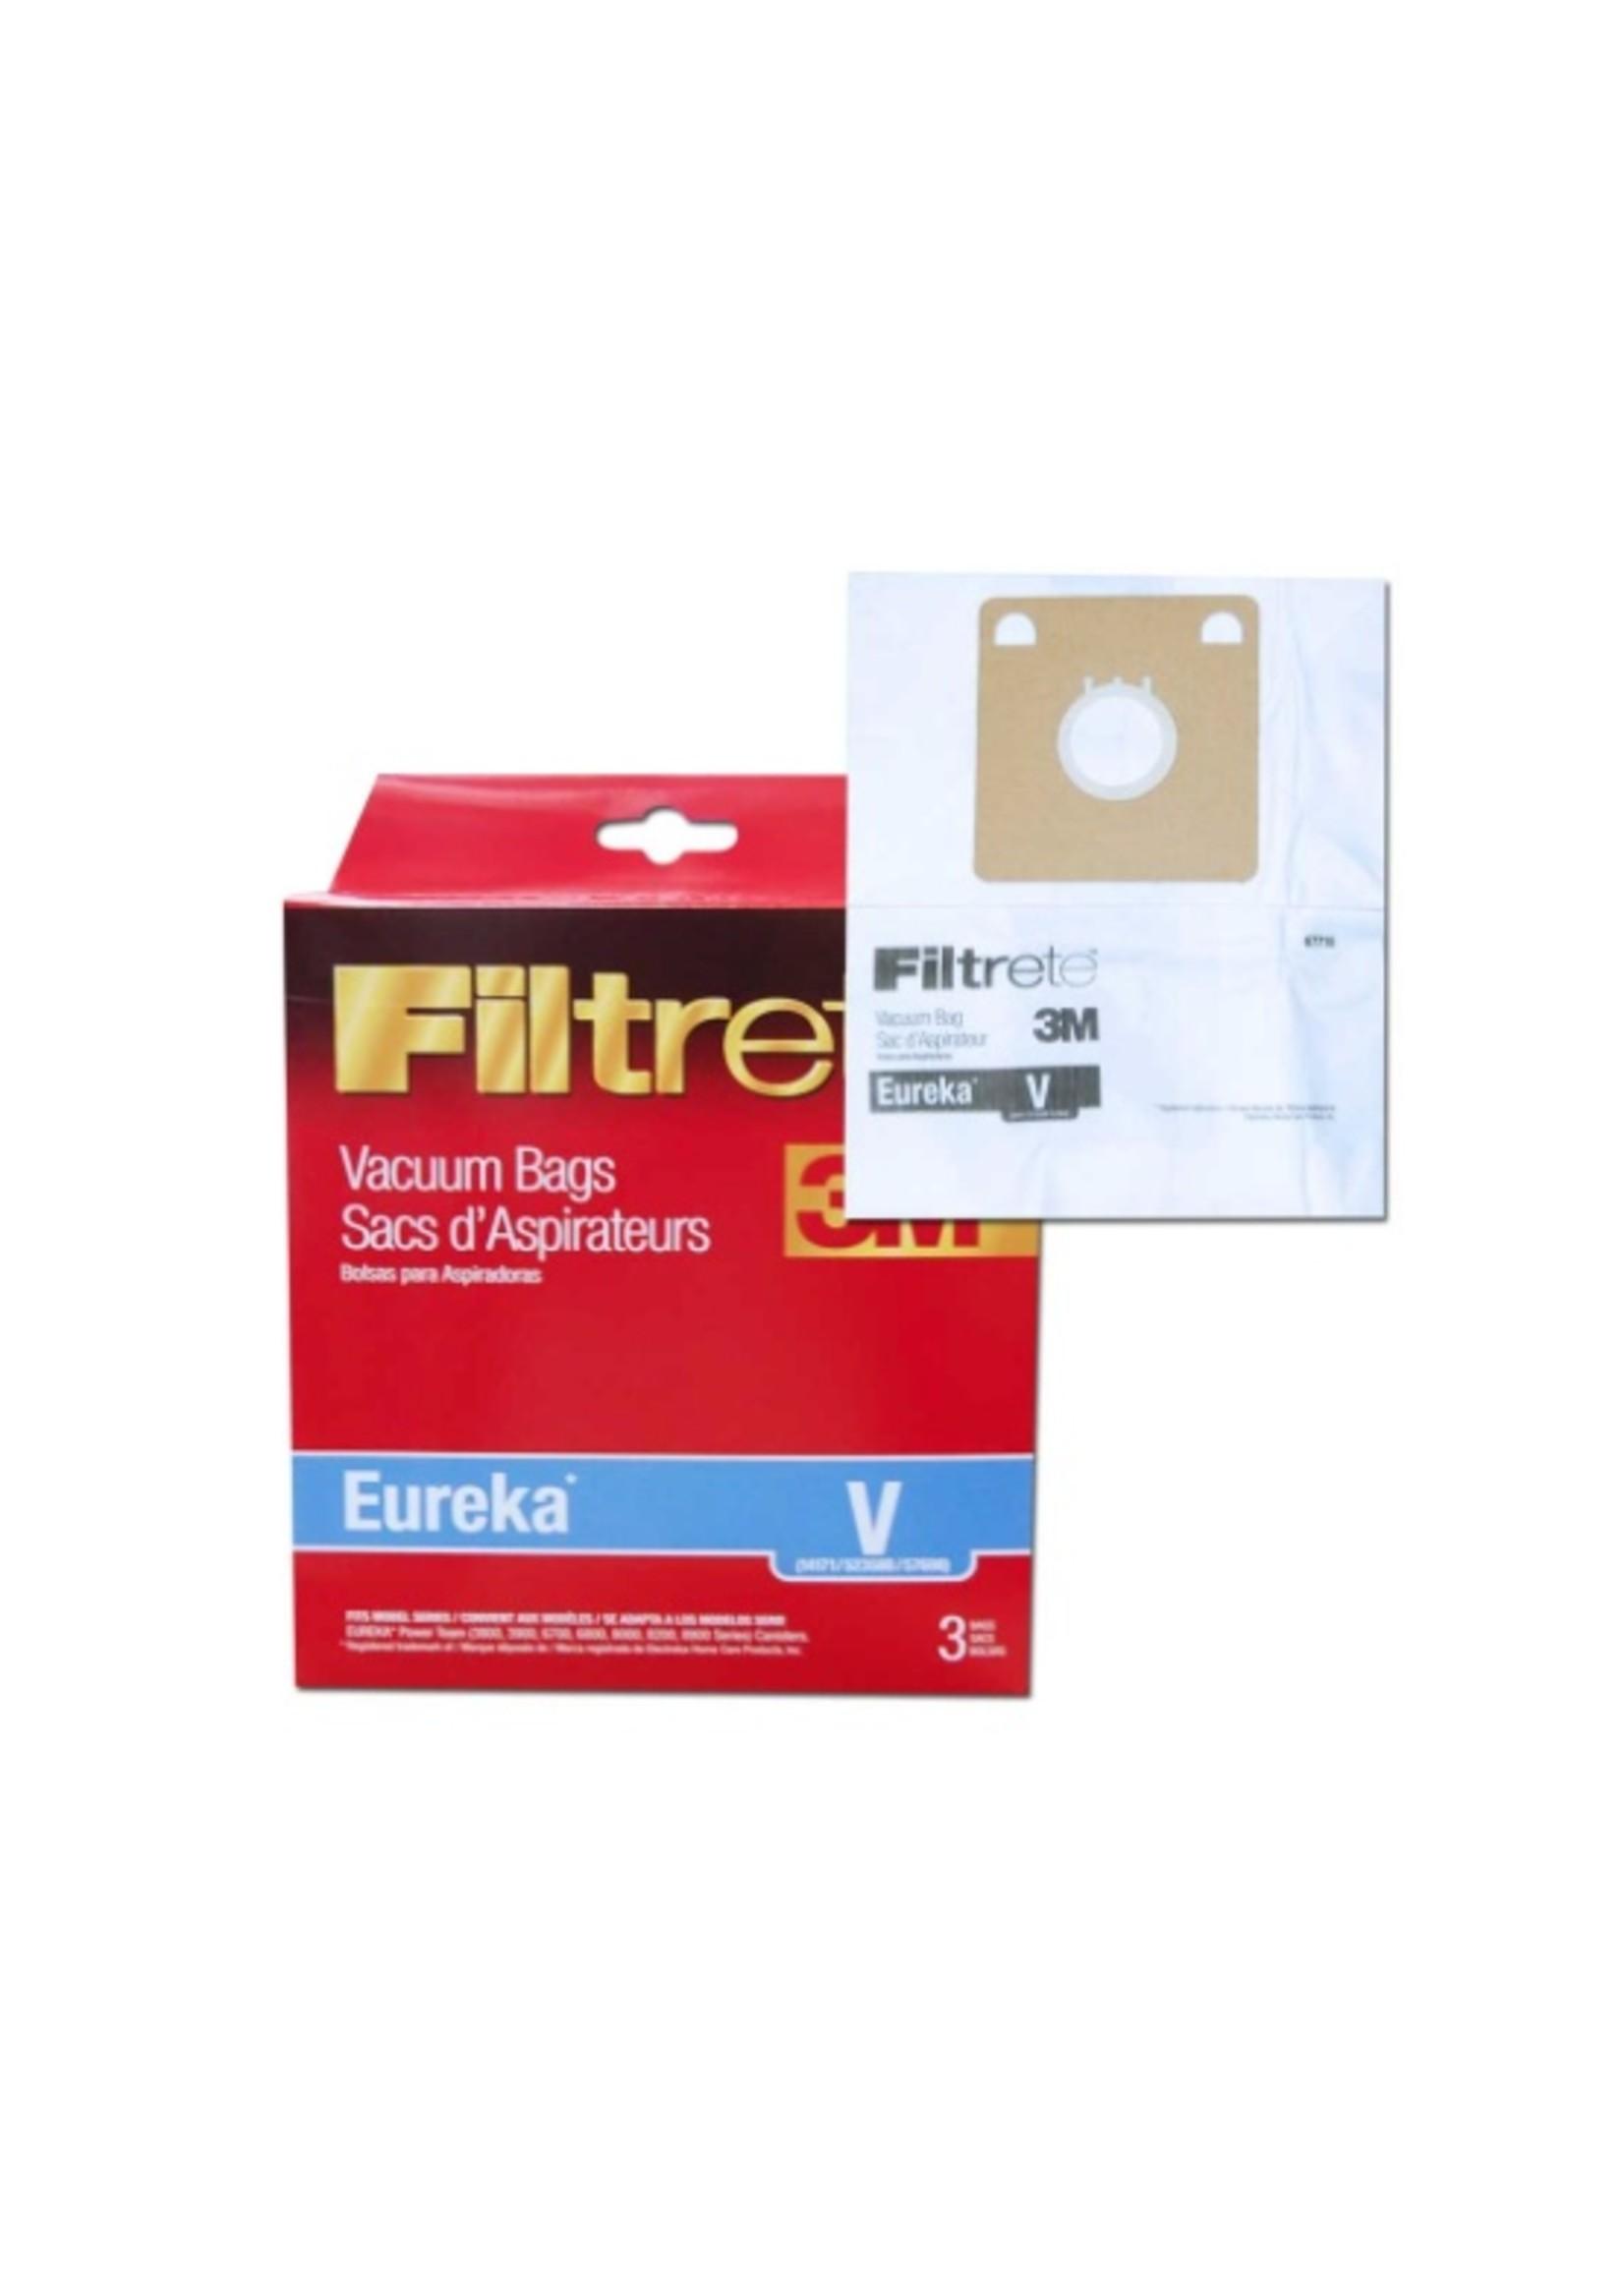 Filtrete 3M Eureka V (3 Pack) Filtrete 3M